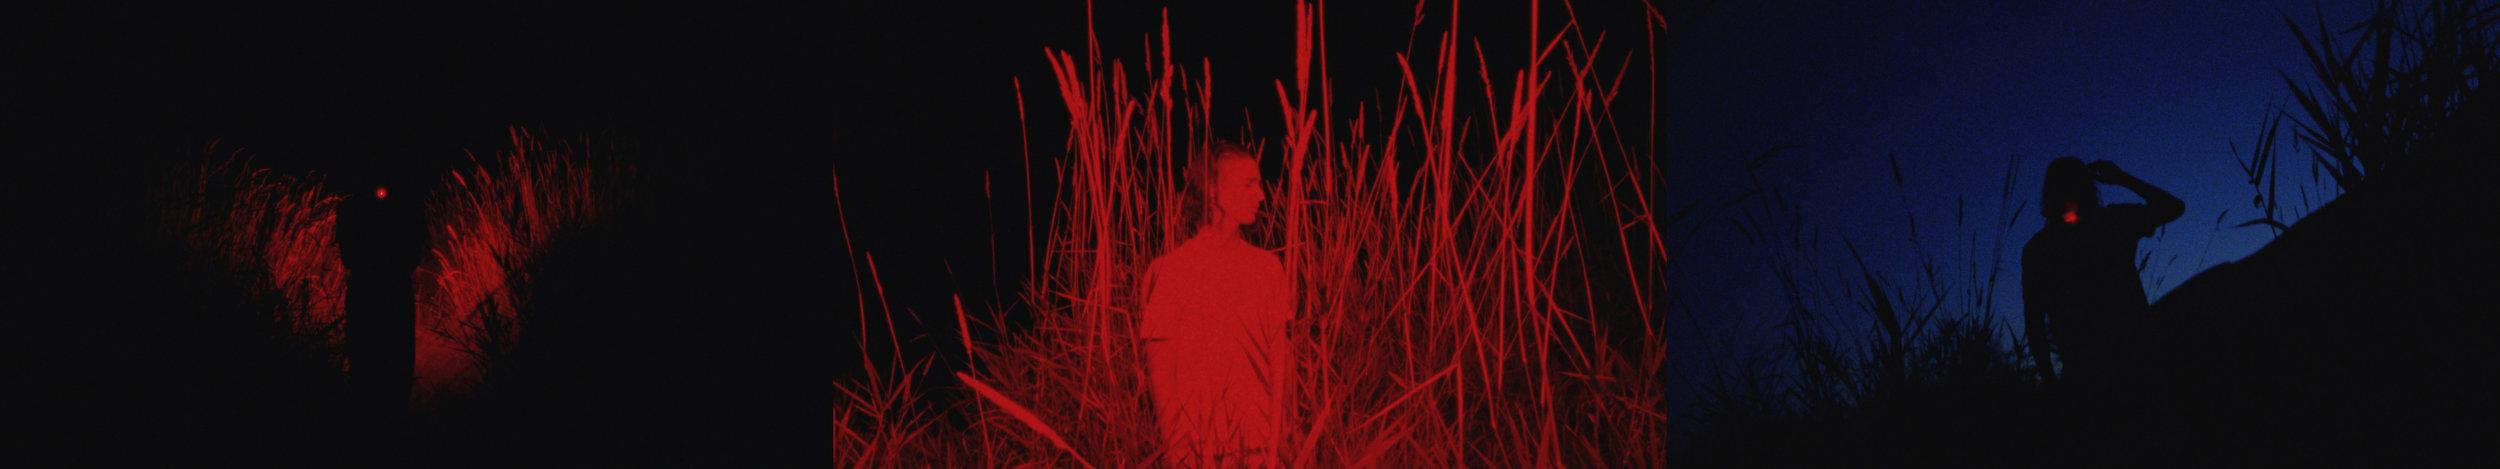 Music Video  Subconcious Self Sabotage - 1000 Petal Lotus ft. ft. Angus Tarnawsky